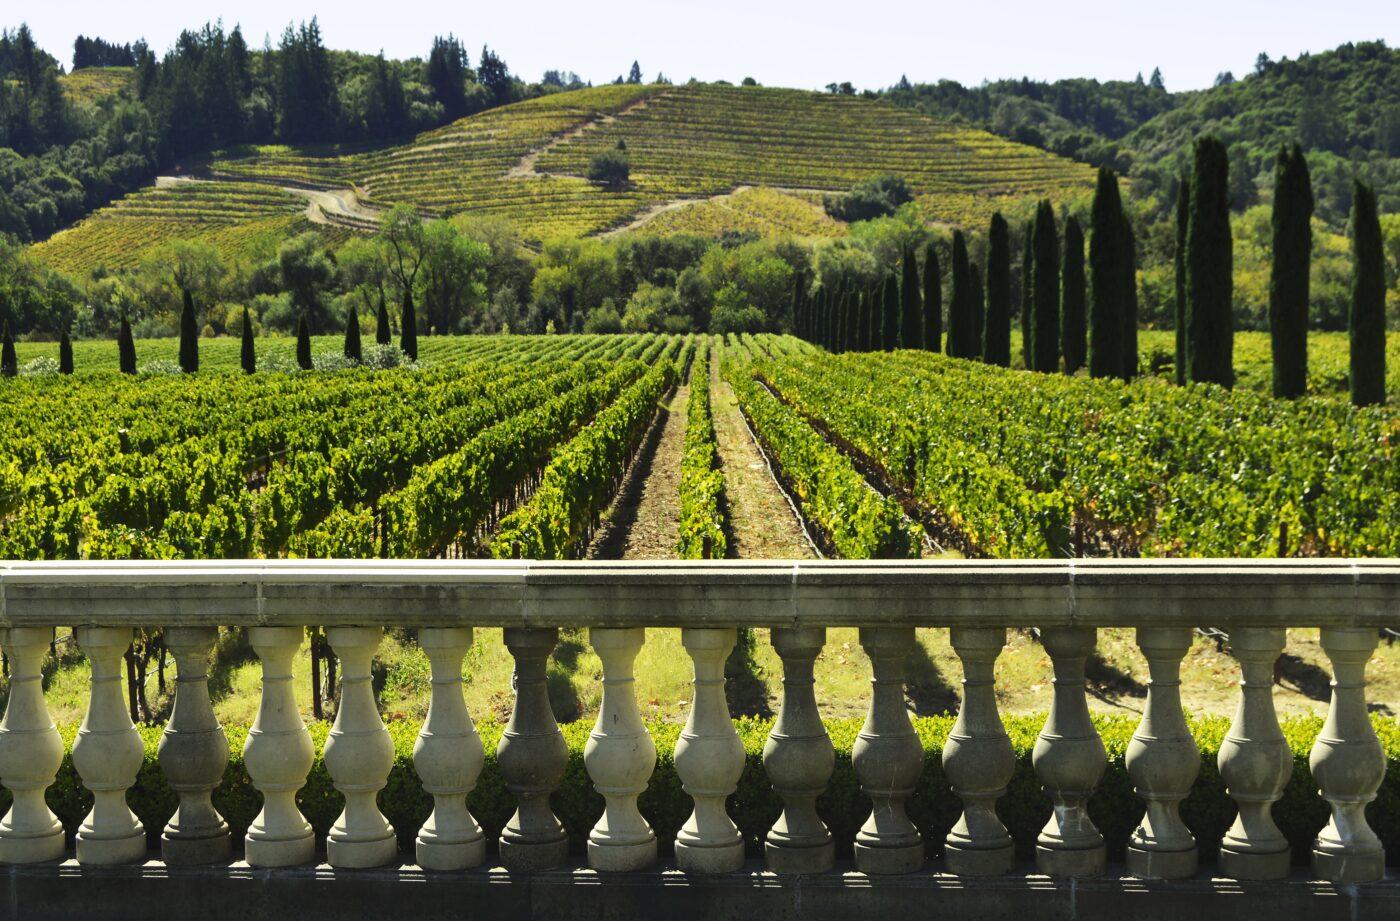 France Vacation Rentals Near Bordeaux's Famous Vineyards